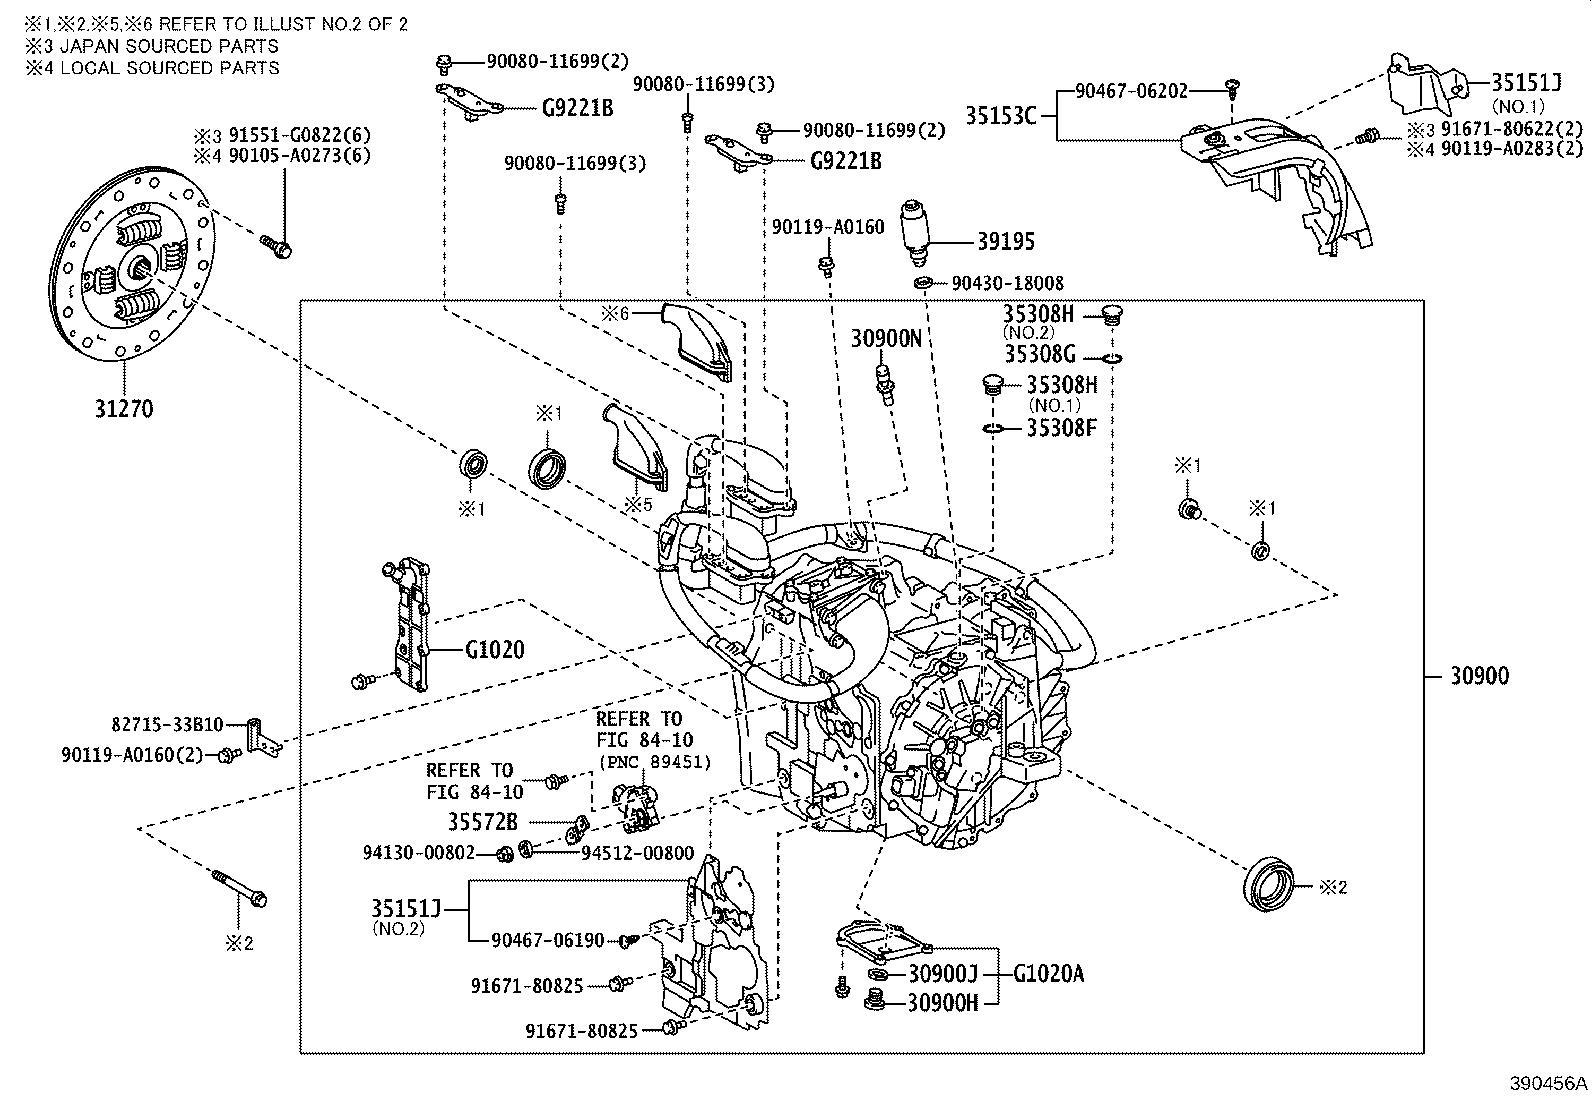 Toyota Camry Transaxle Assembly Hybrid Vehicle